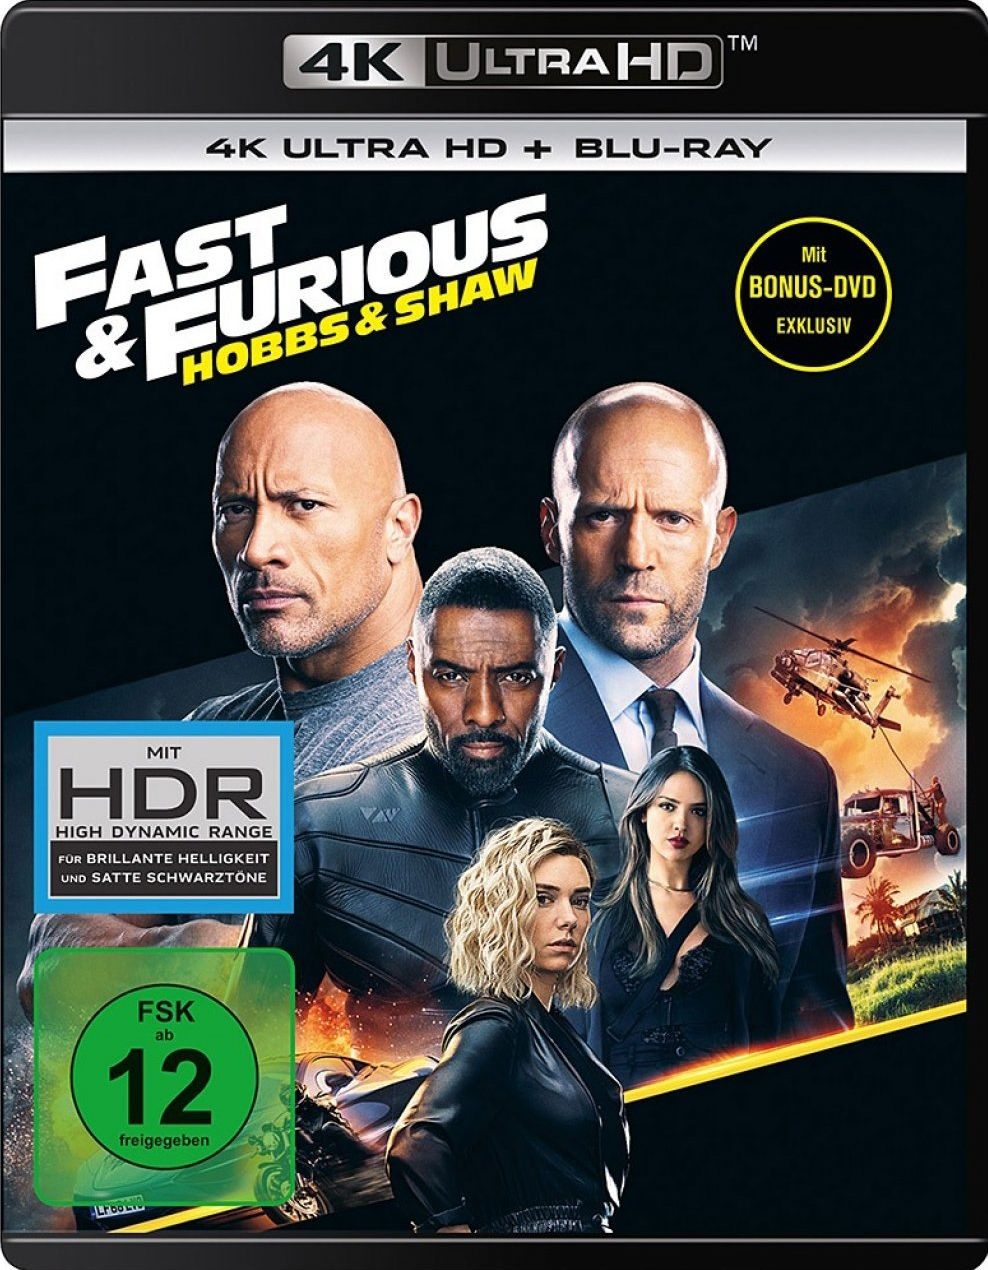 Fast & Furious - Hobbs & Shaw (3 Discs) (UHD BLURAY + BLURAY)